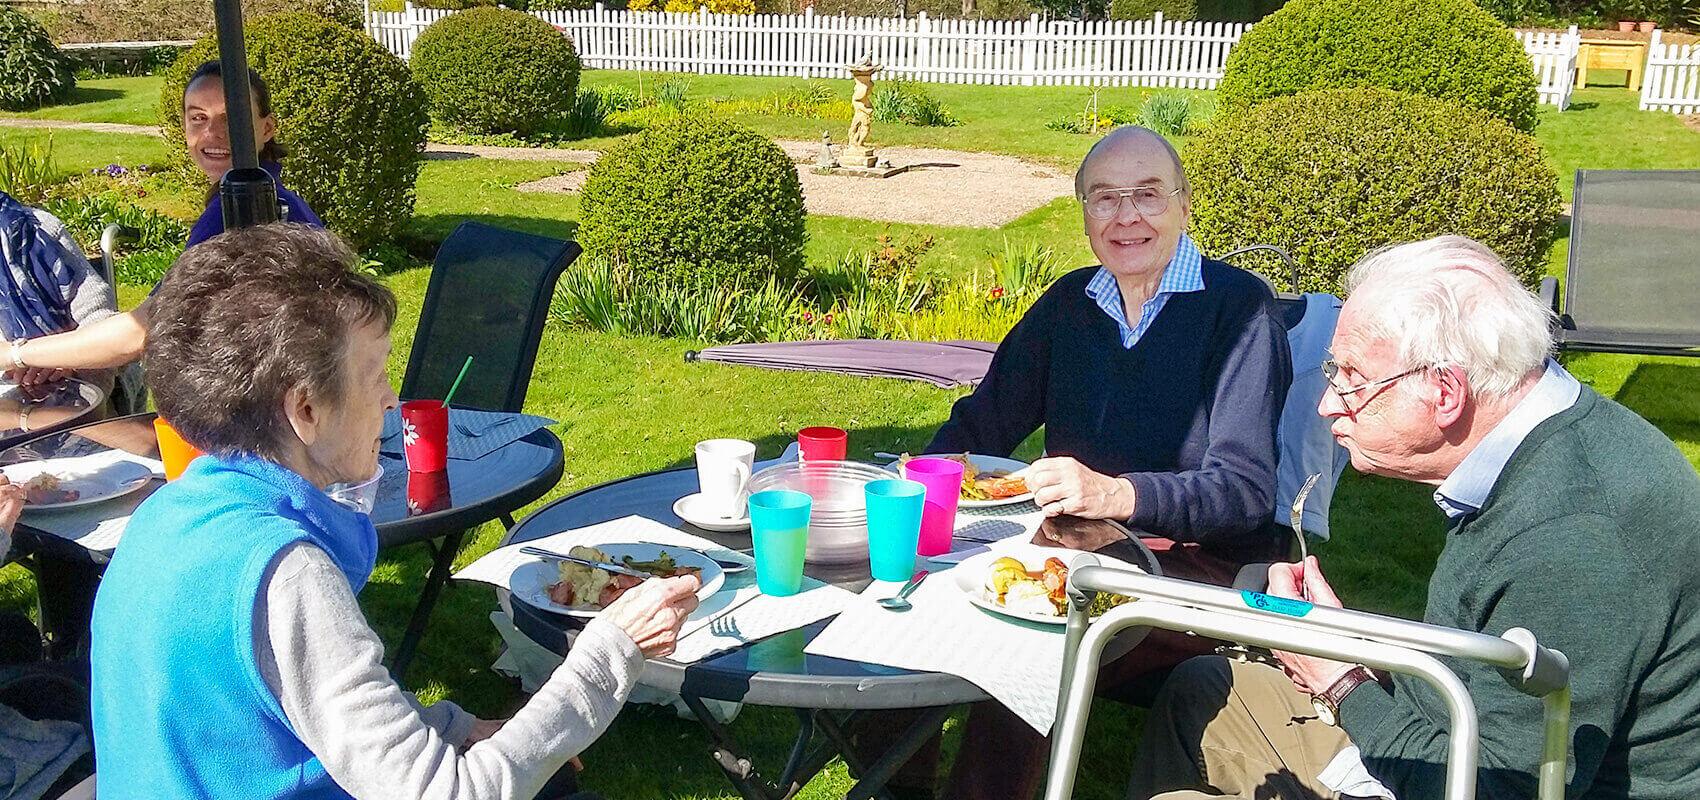 Evendine House Care Home residents enjoying sunshine fullwidth image